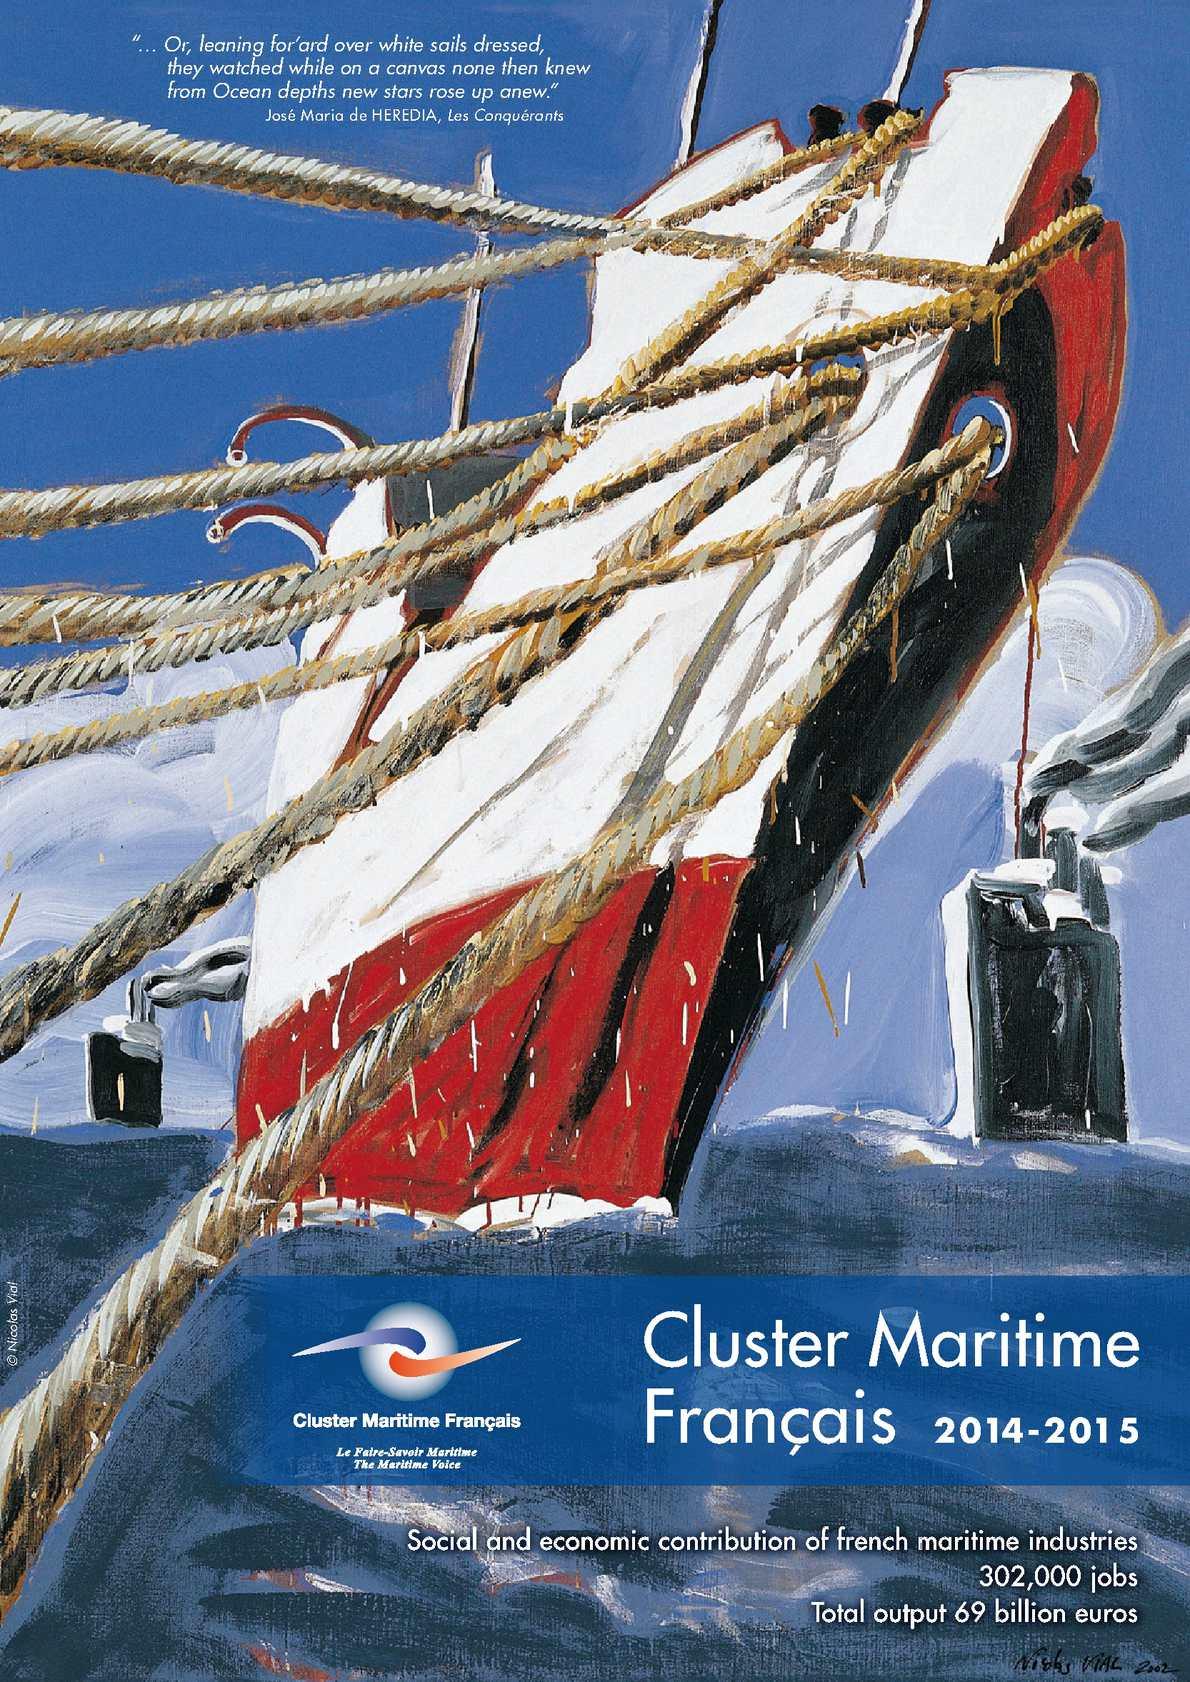 Calamo Cluster Maritime Franais Brochure 2014 2015 English War Pirate Ship Likewise Rms Titanic Sinking On Tall Diagram Version